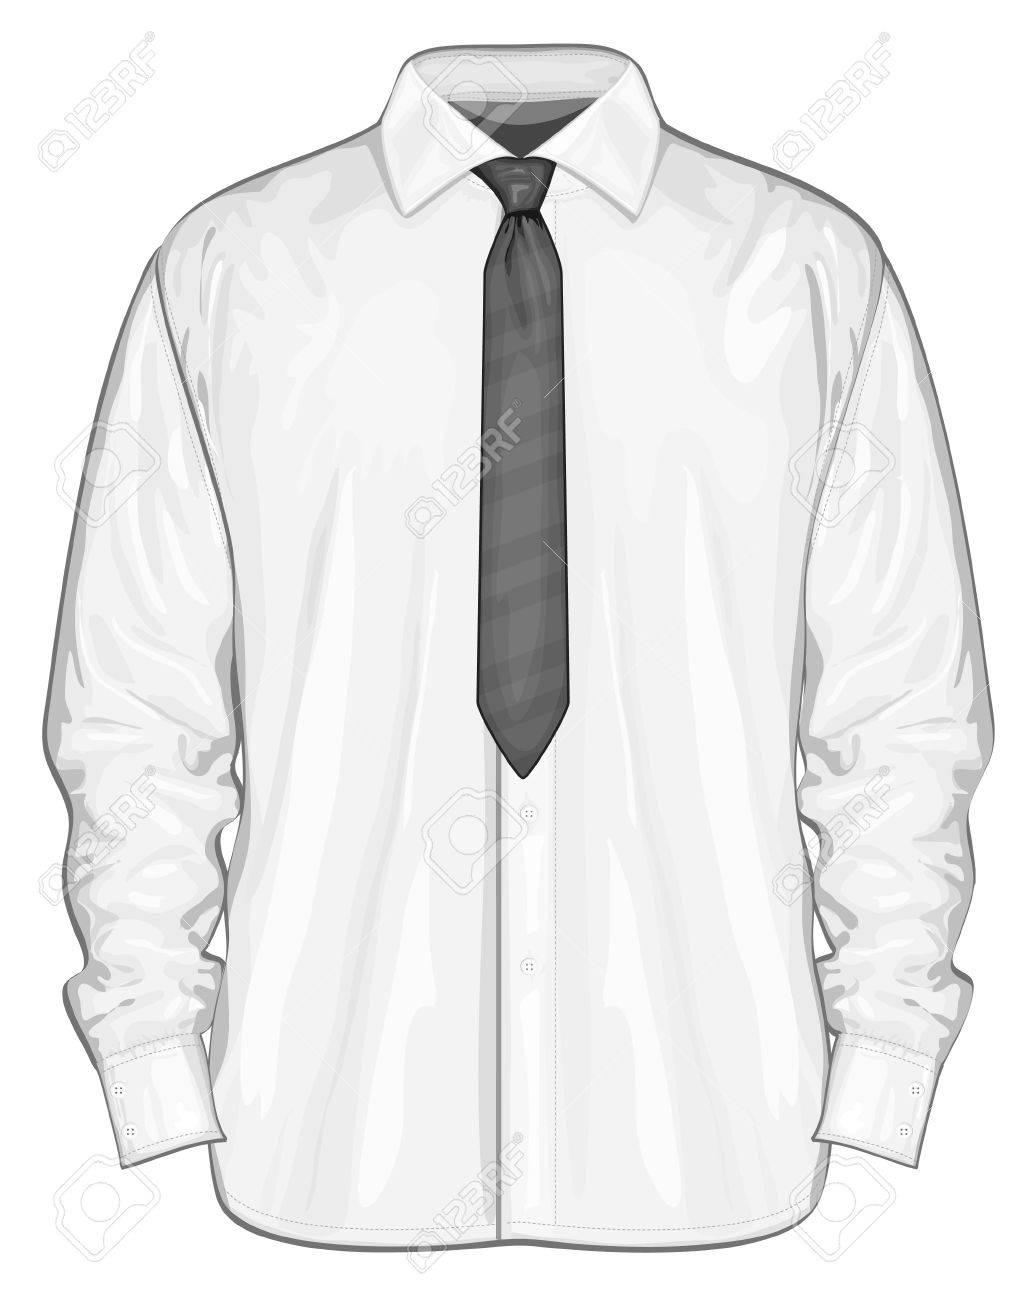 Vector illustration of dress shirt button.